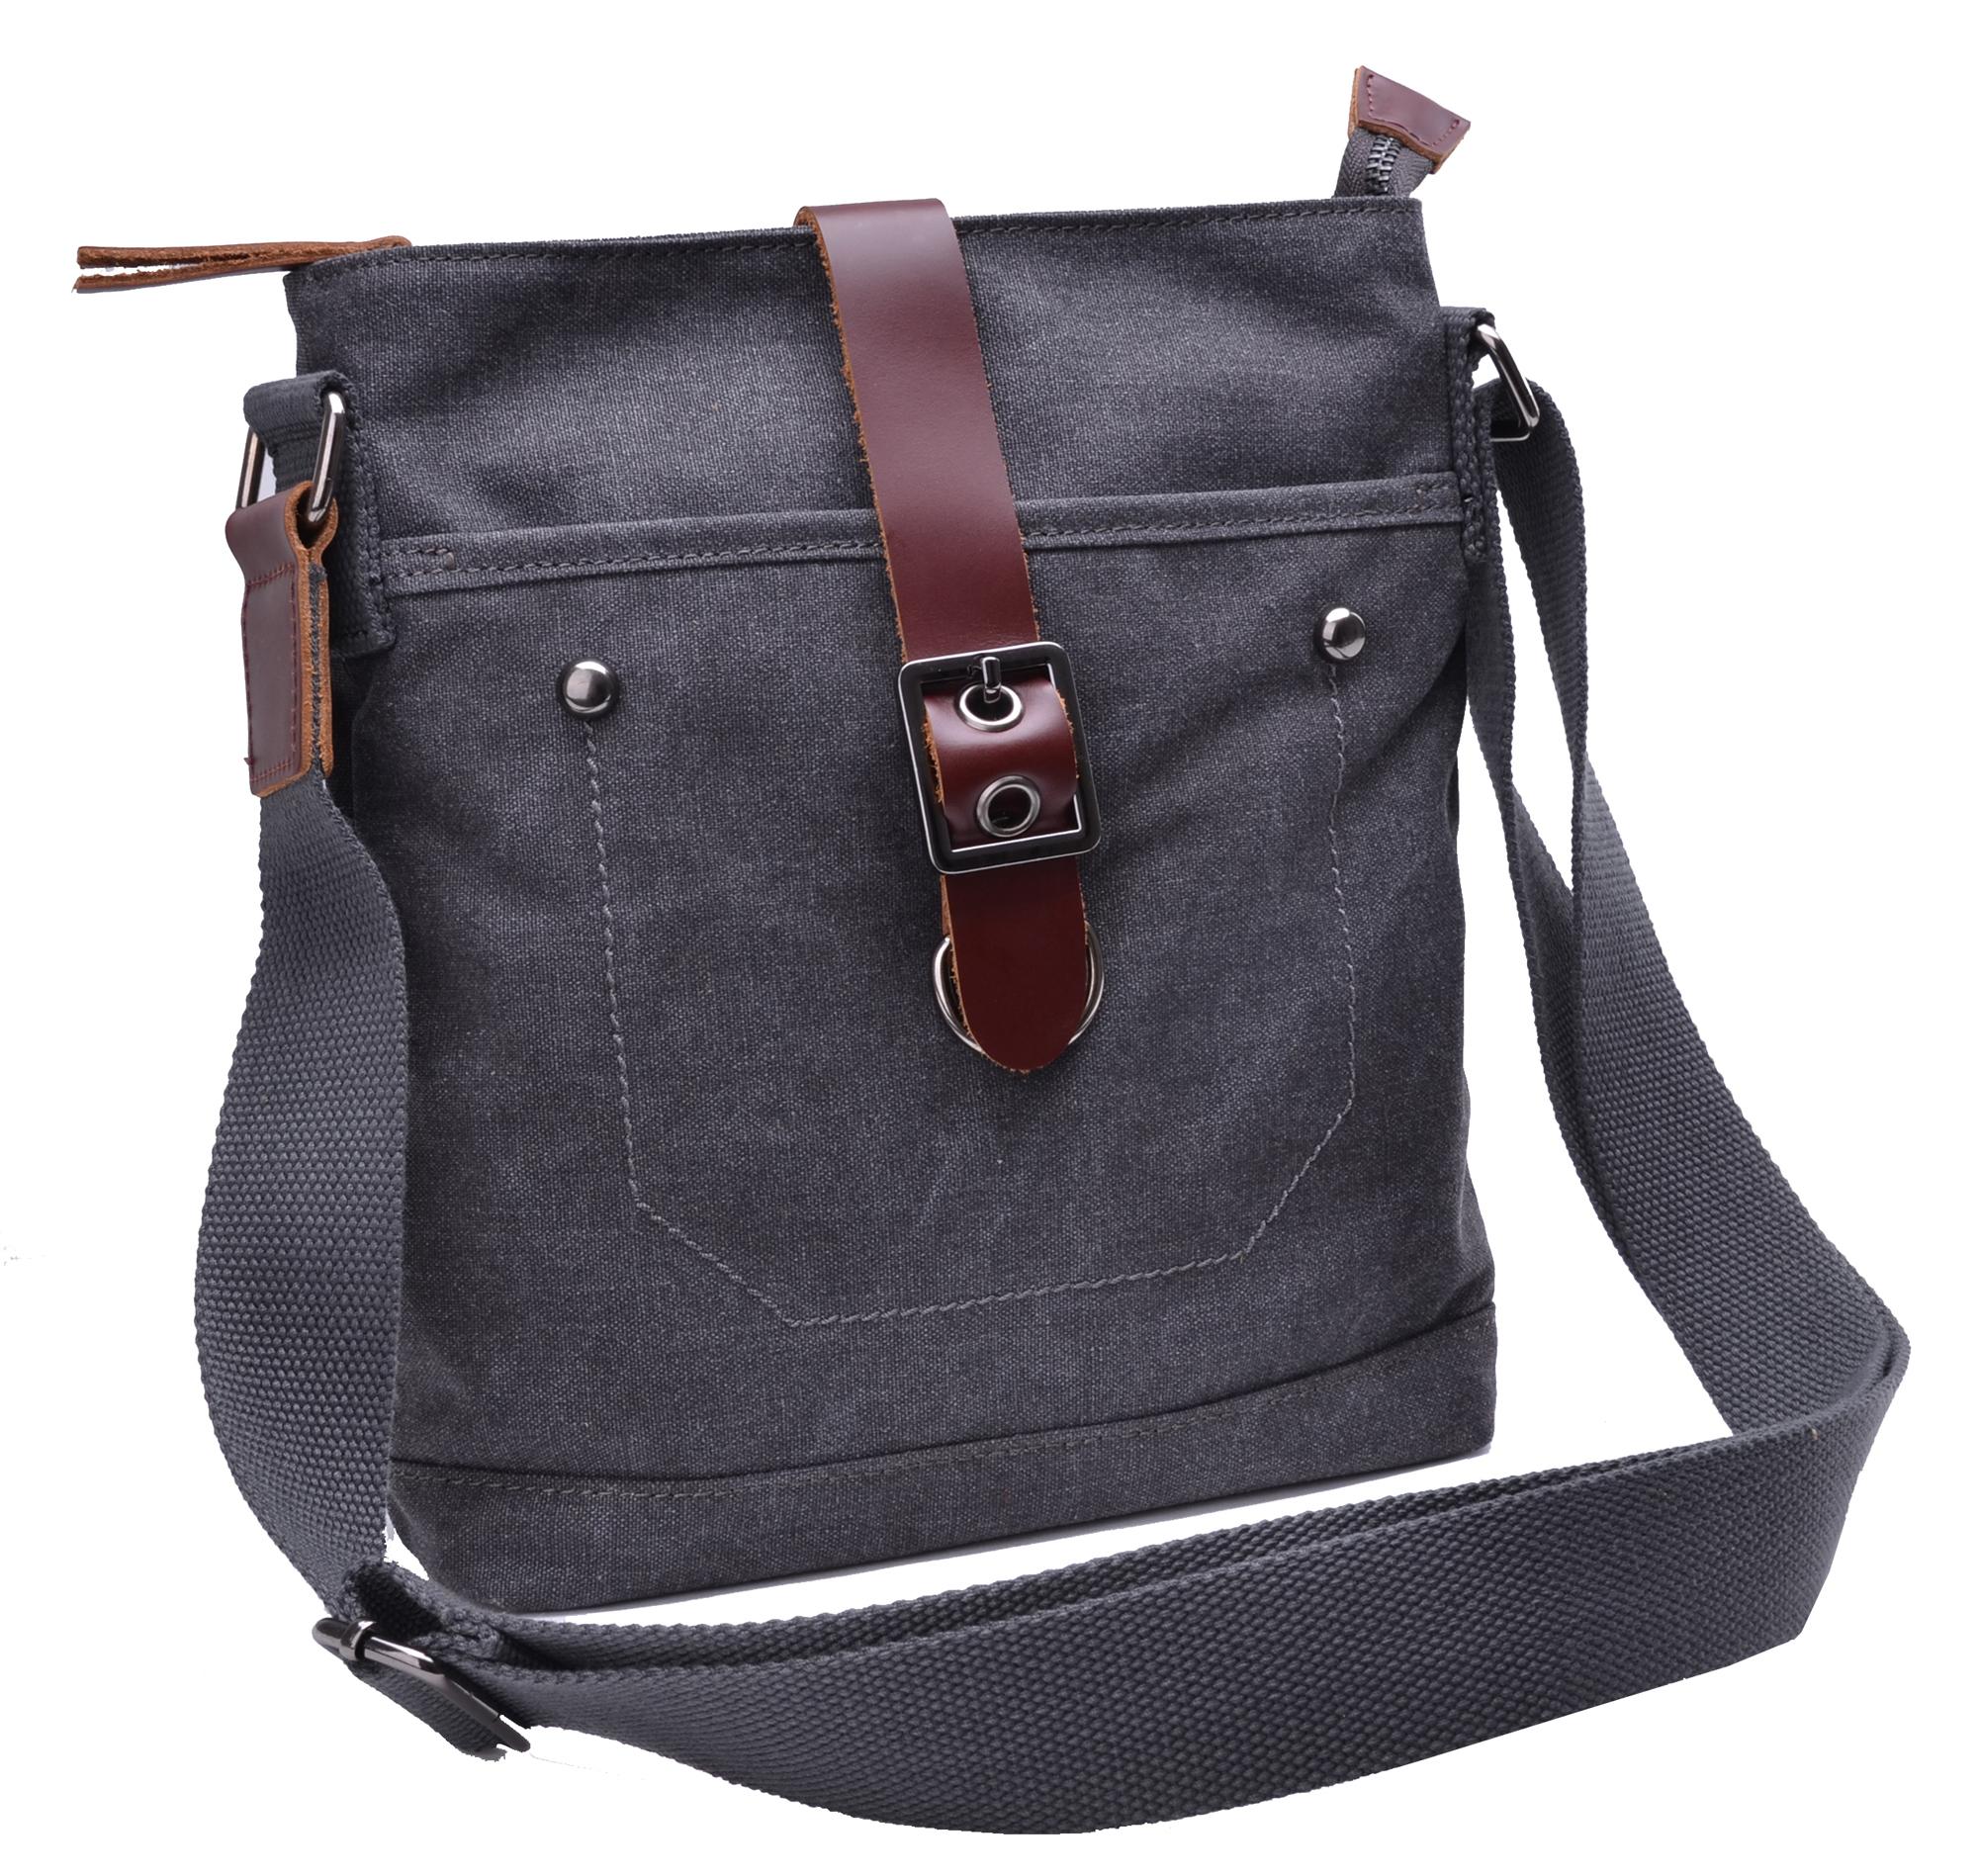 Gootium Canvas Leather Small Cross Body Messenger Bag Shoulder Bag ...